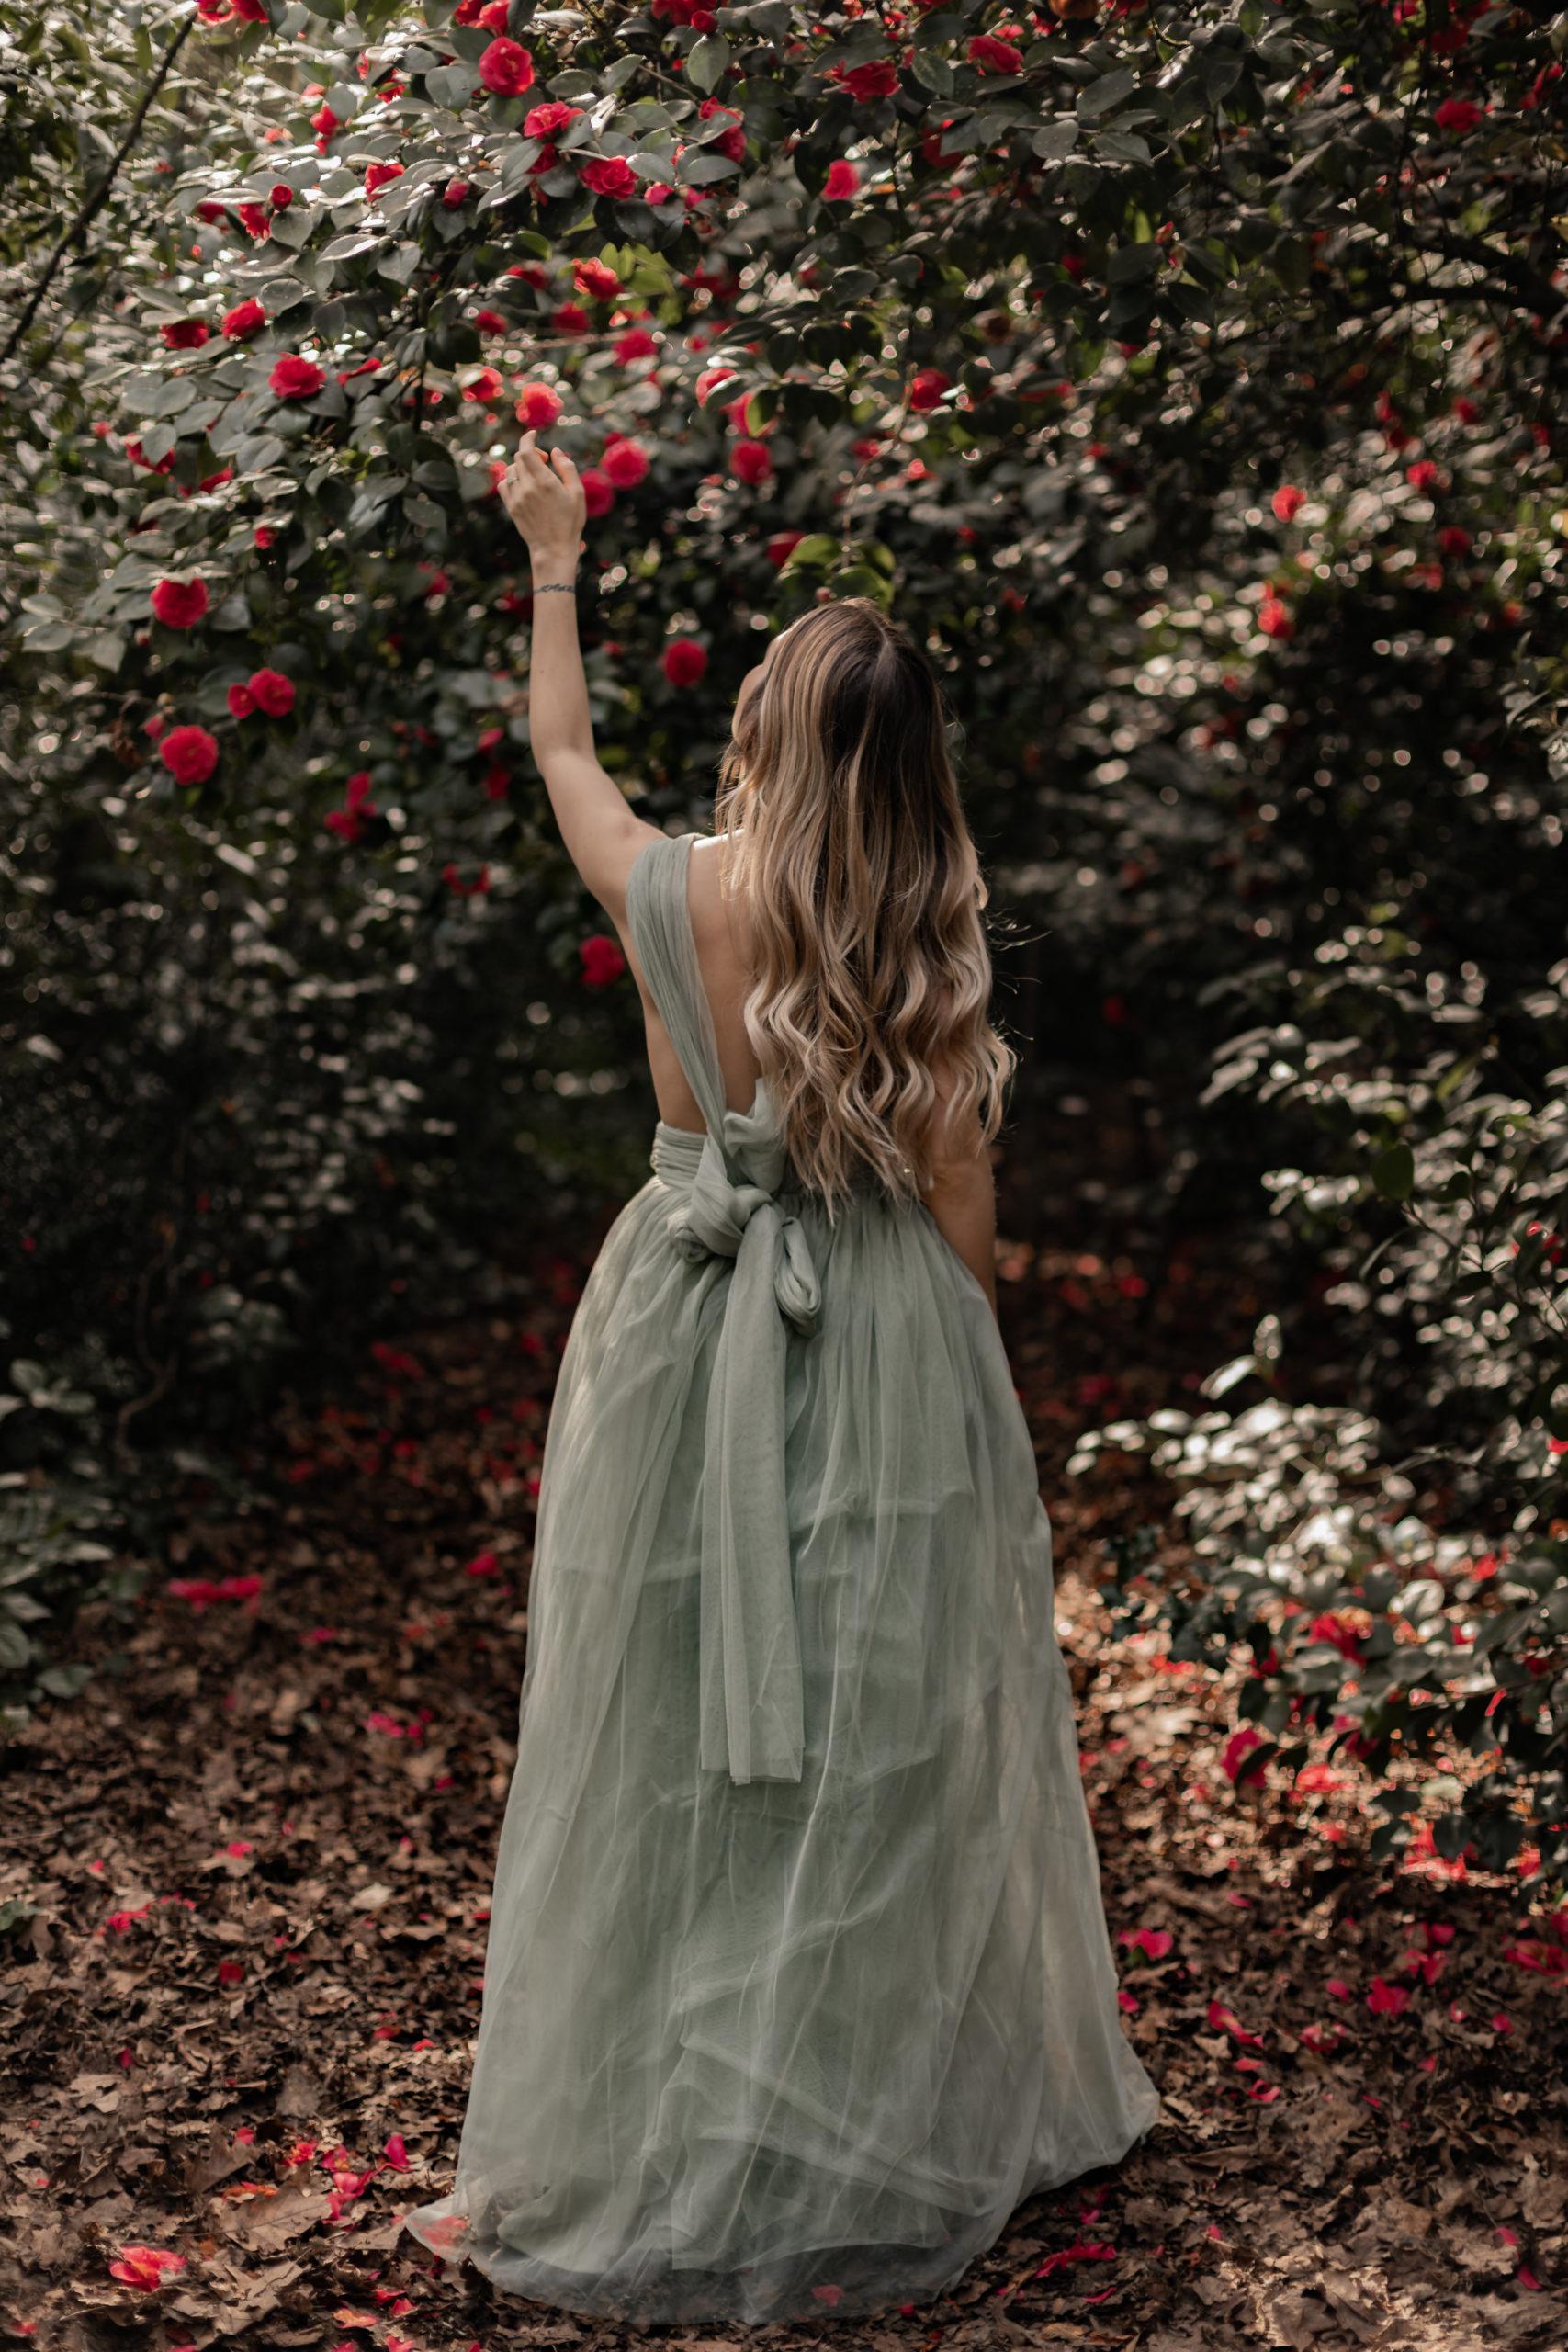 Dans ma robe de princesse